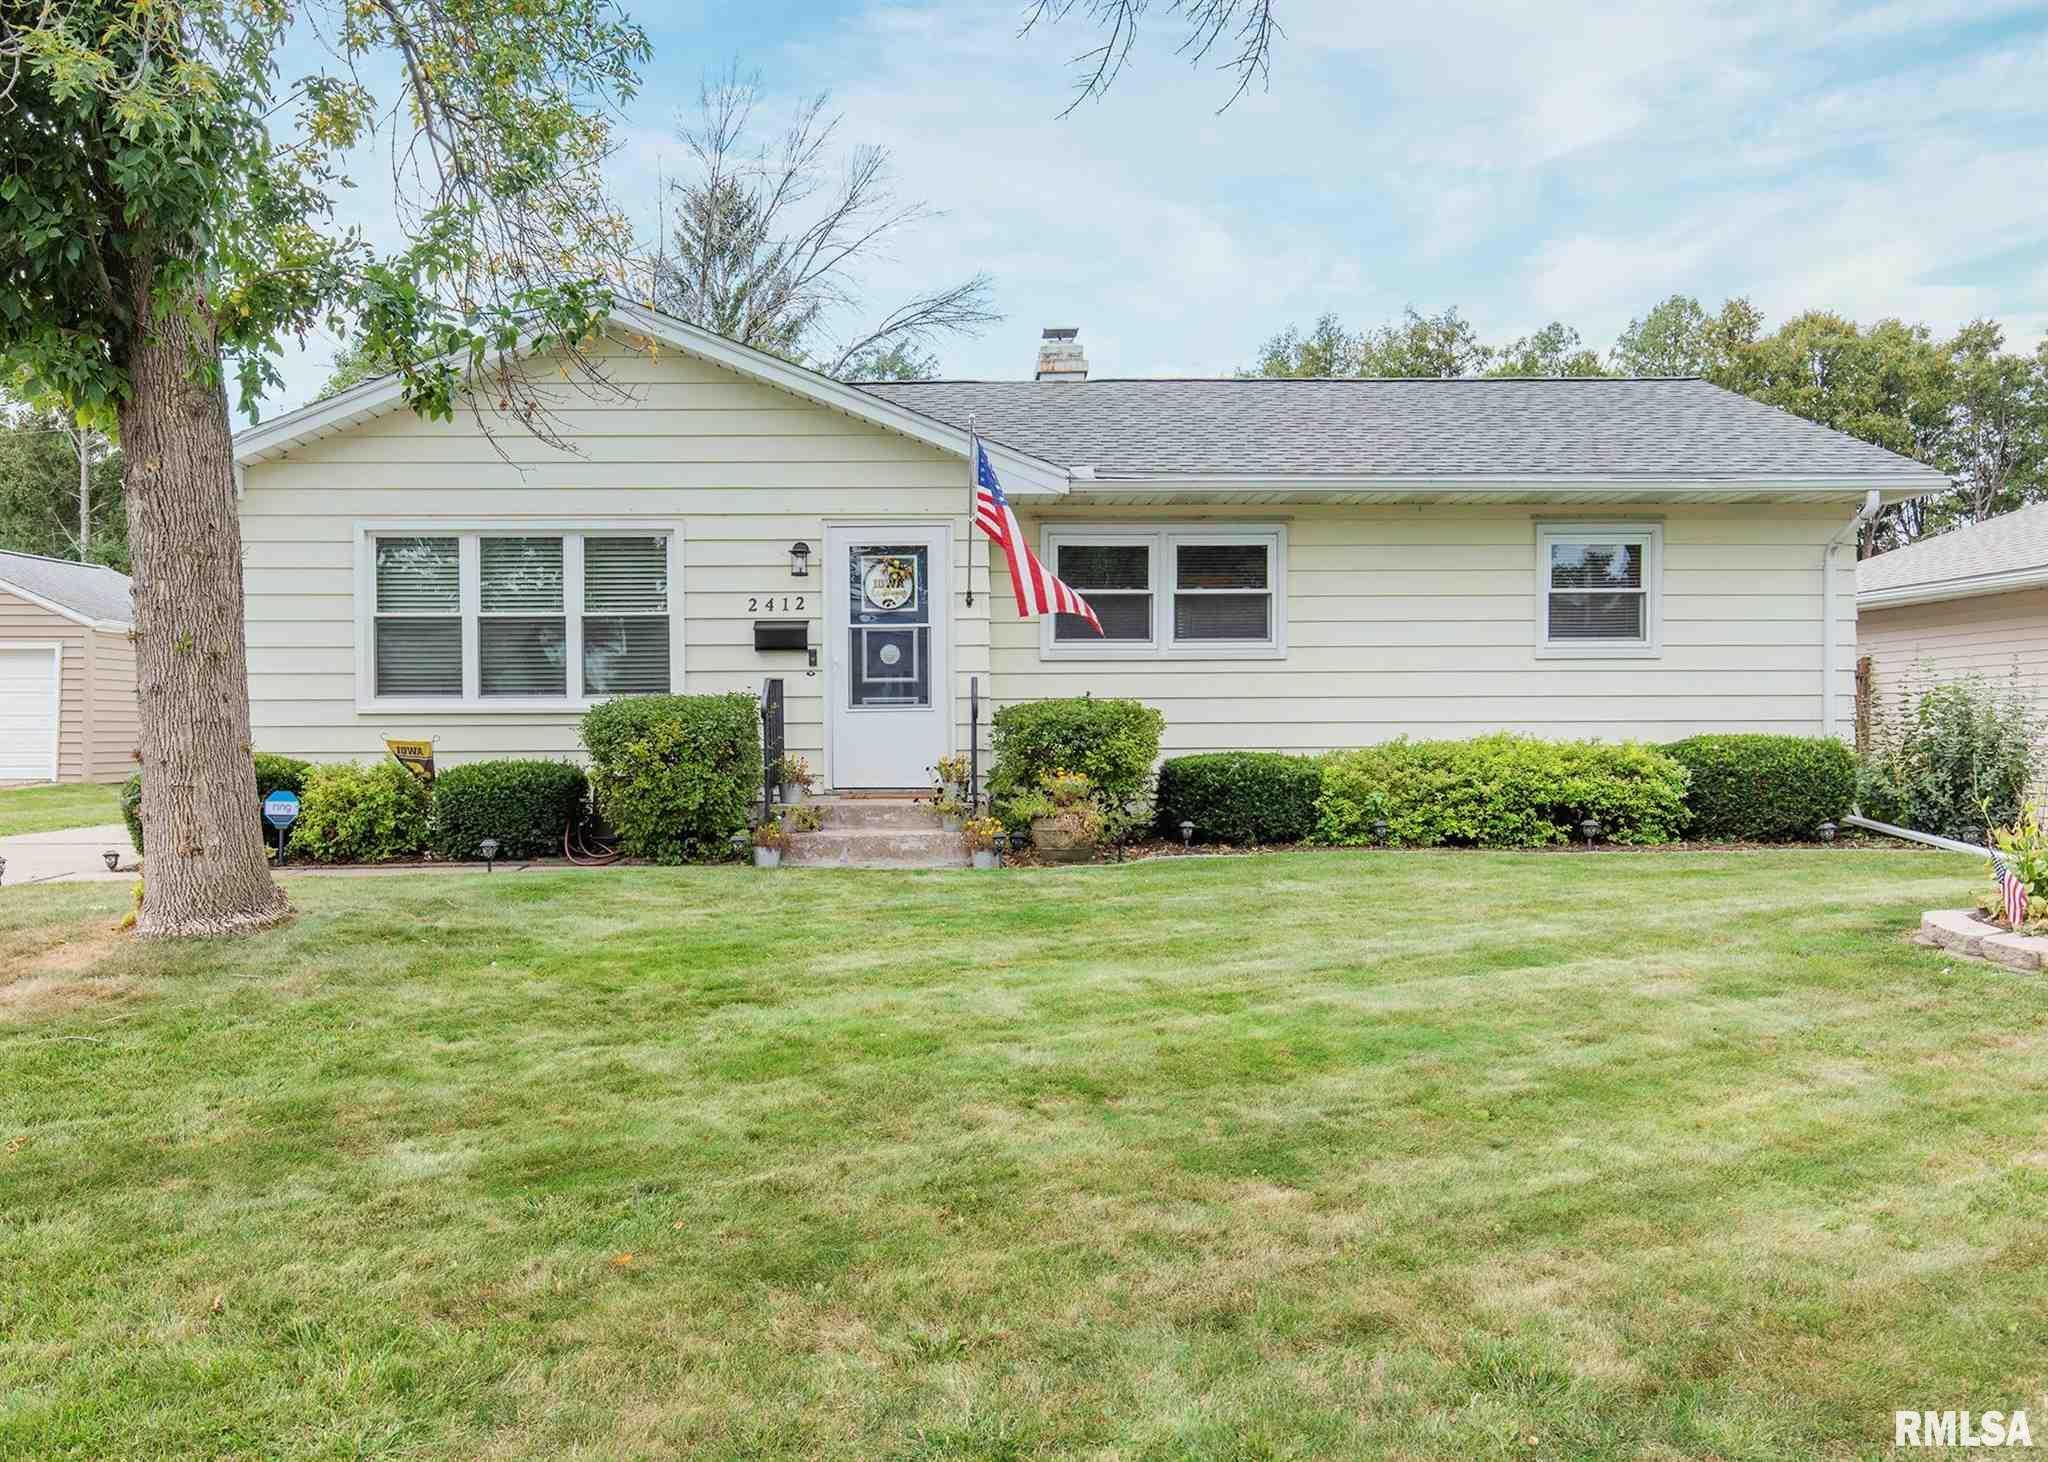 $169,900 - 3Br/1Ba -  for Sale in Mangel, Davenport